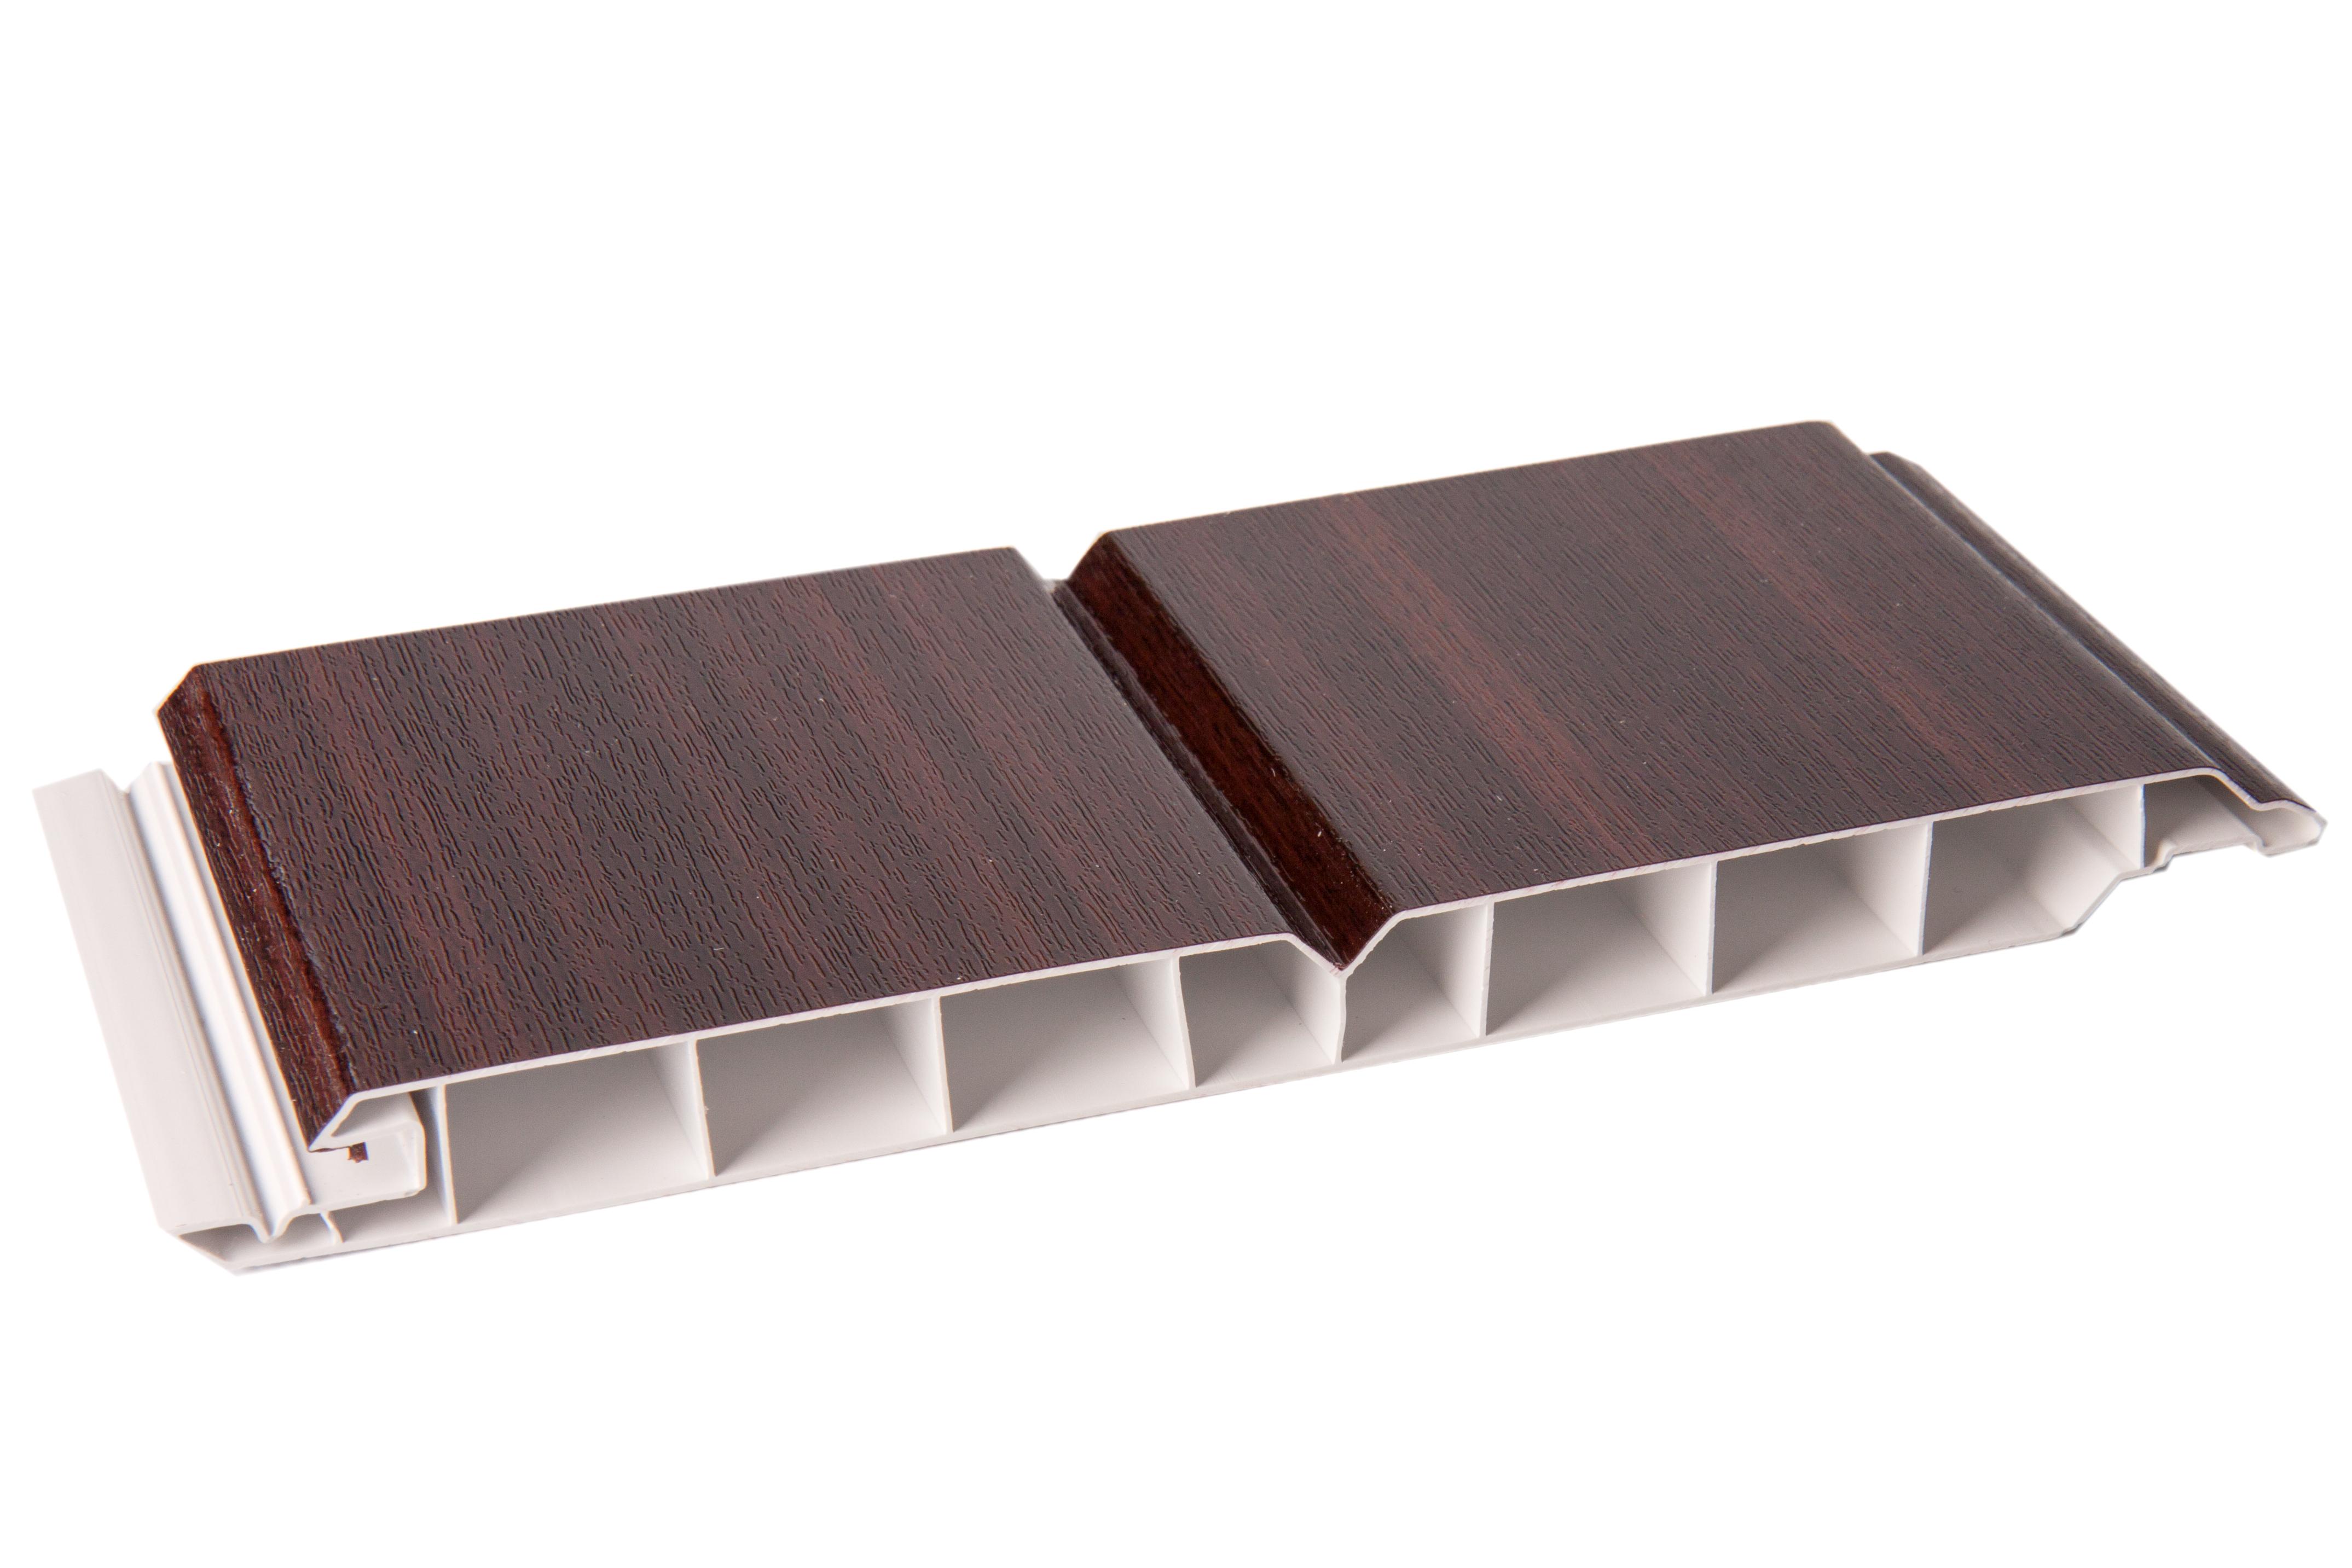 paneele wand und decke 17 200mm mahagoni. Black Bedroom Furniture Sets. Home Design Ideas